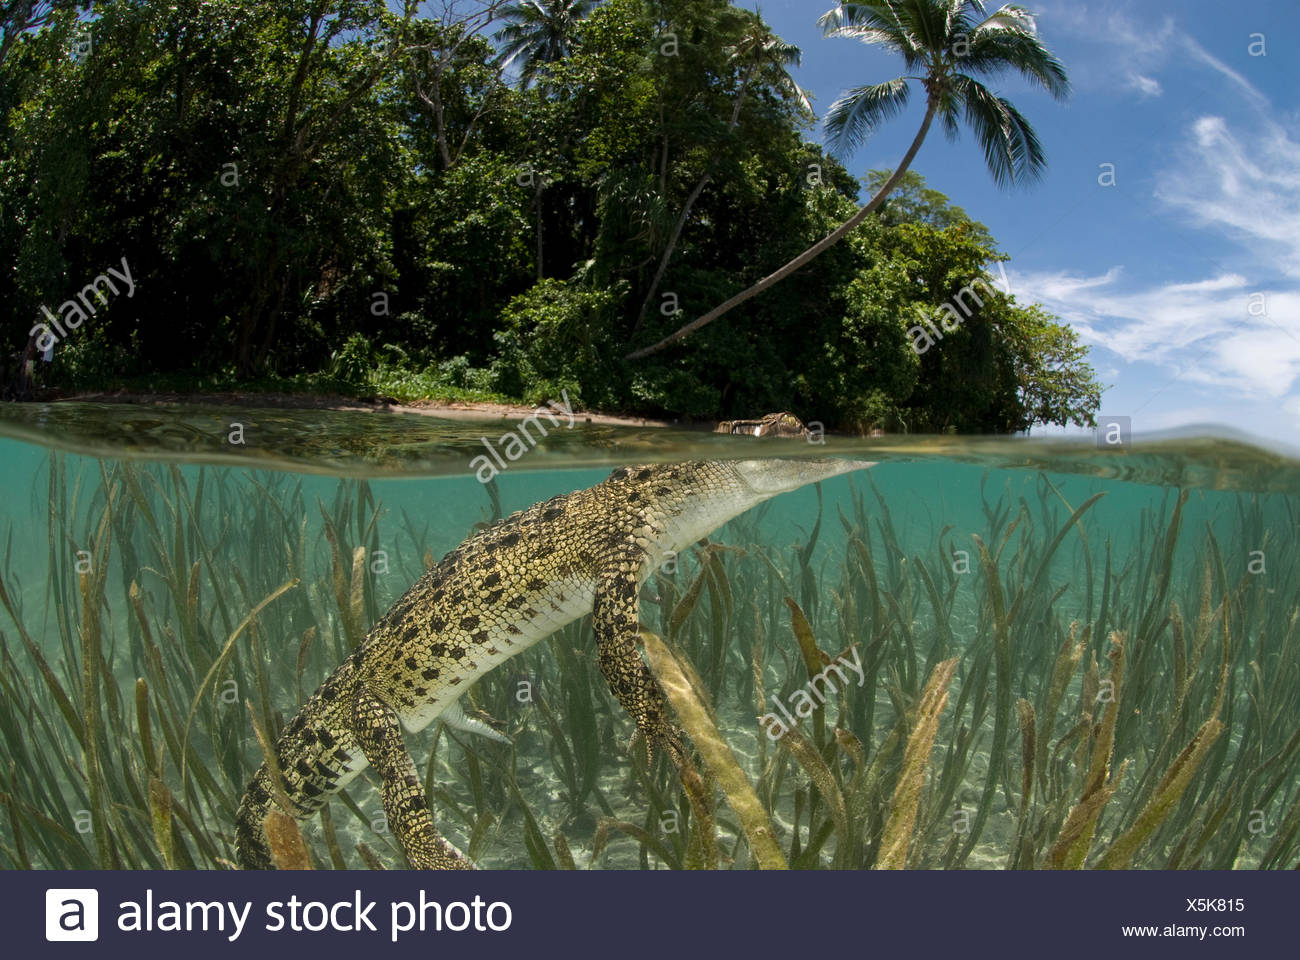 Saltwater crocodile (Crocodylus porosus) swimming at water surface, split-level, amongst eelgrass, New Guinea, Indo-pacific. - Stock Image